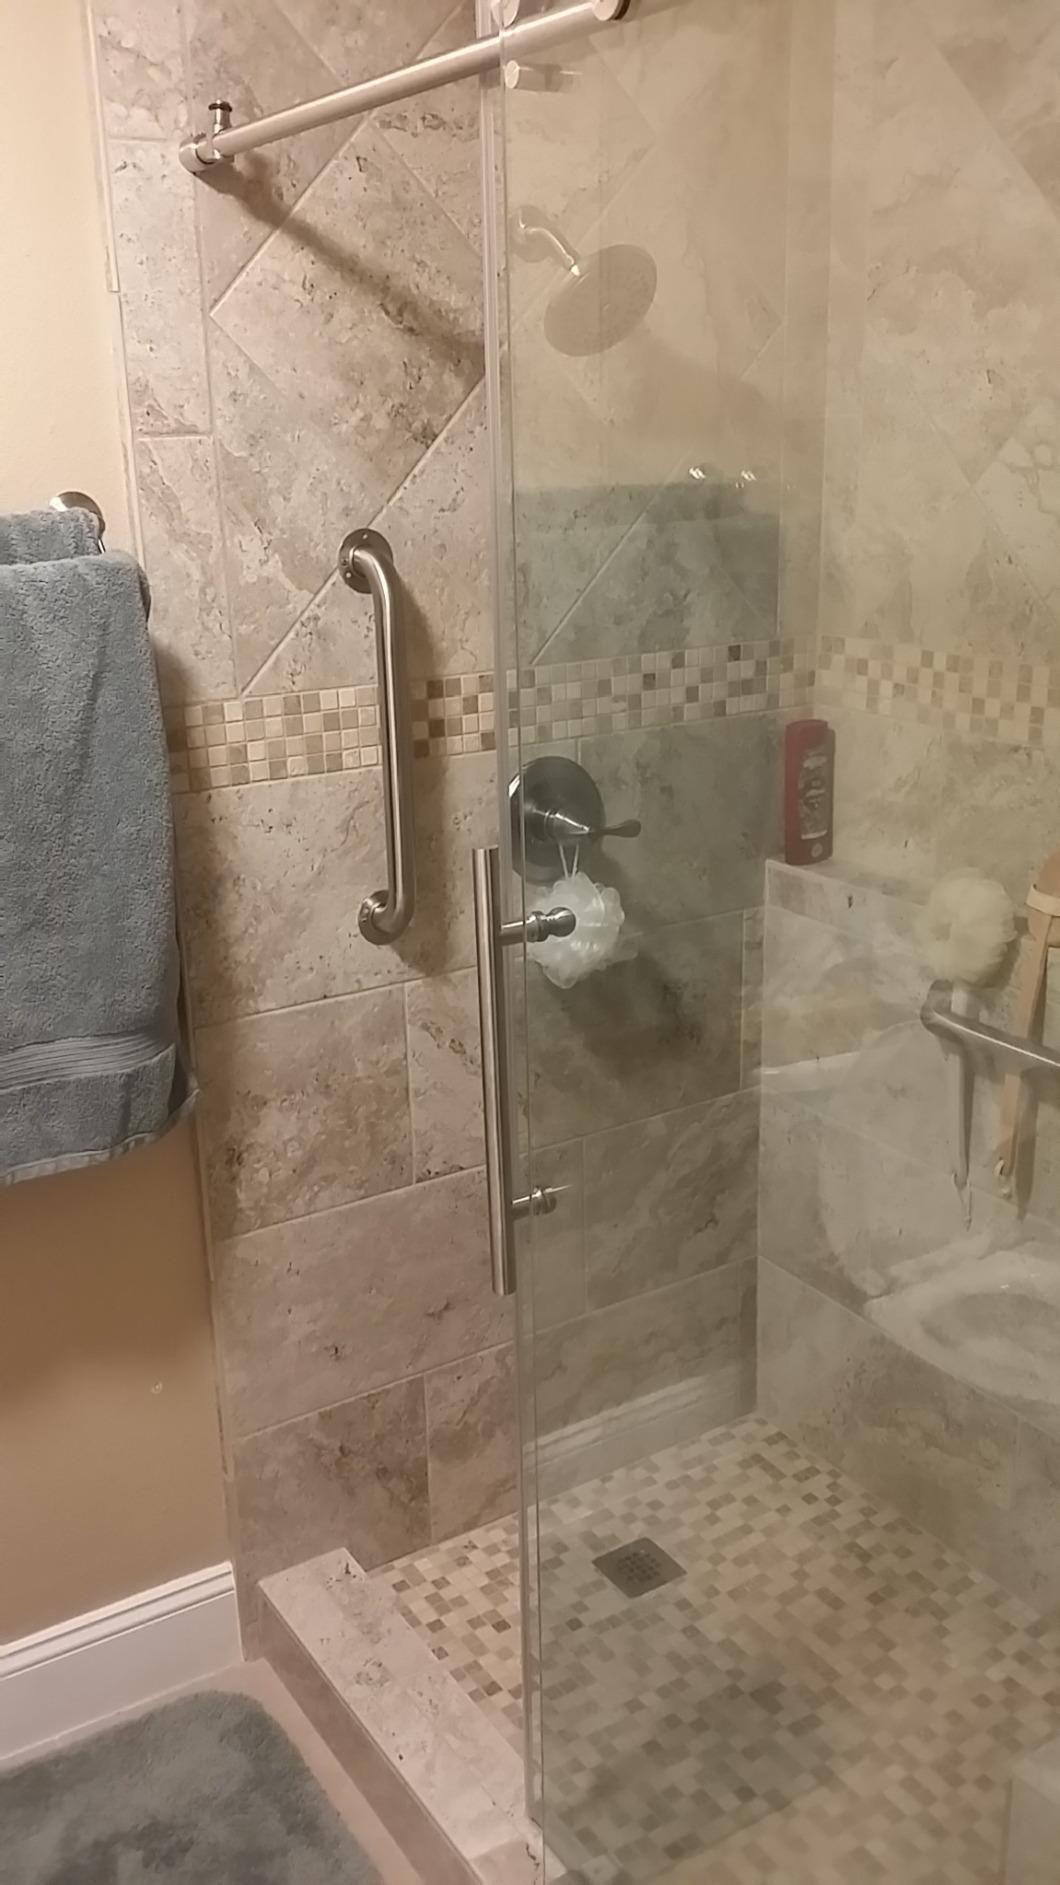 Includes Anti Splash Threshold To Prevent Water Spillage